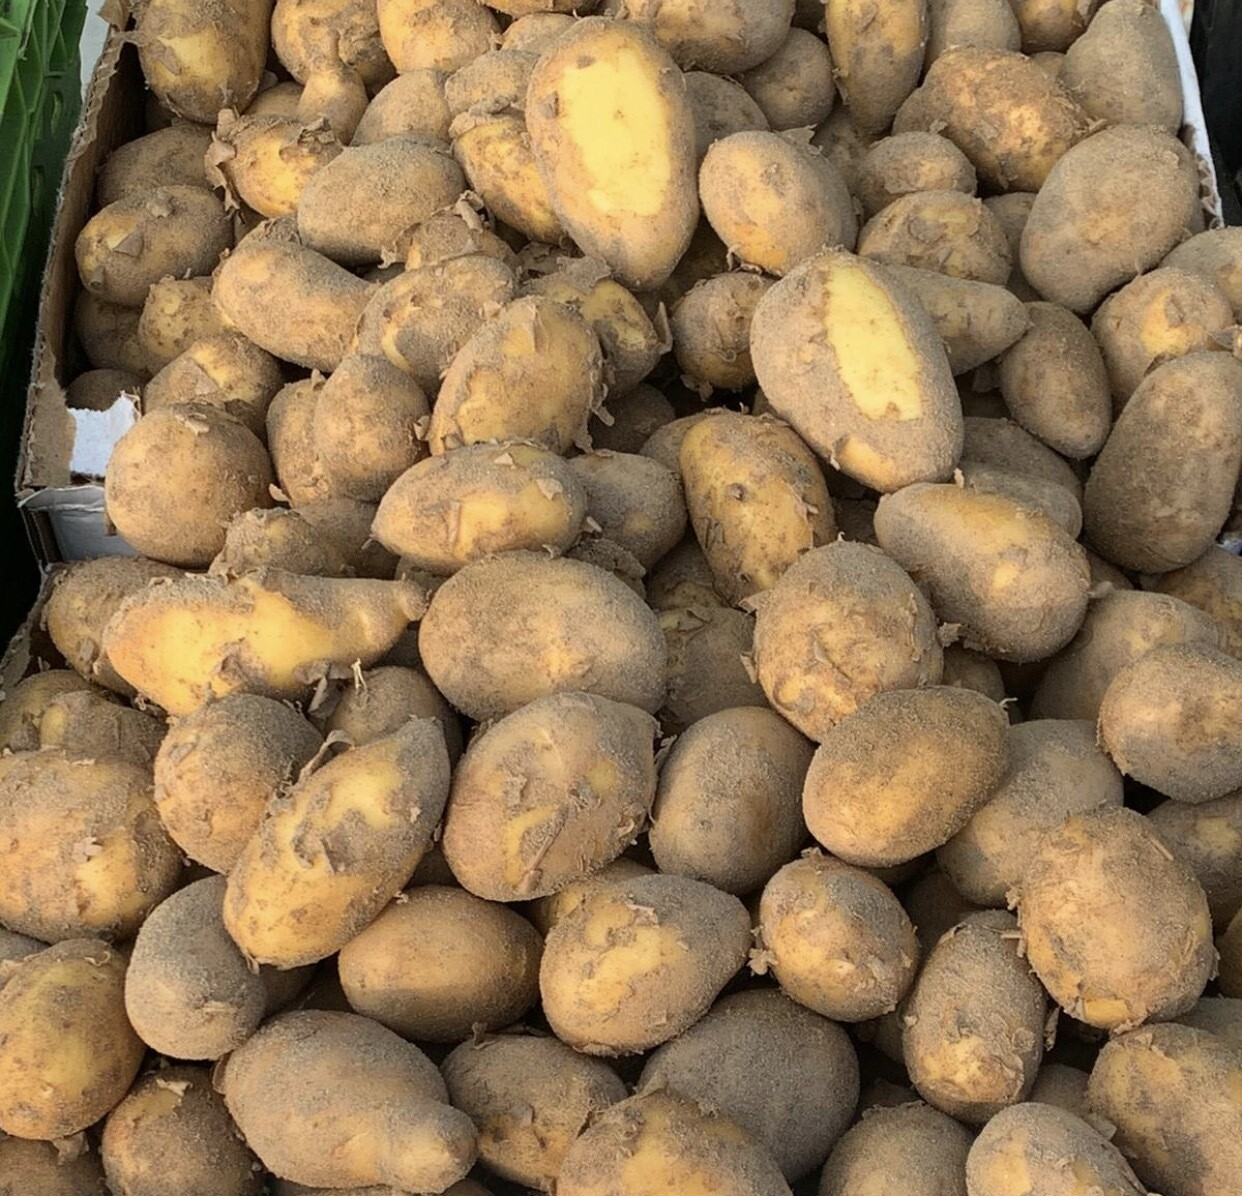 Italian New Potatoes Per Pound